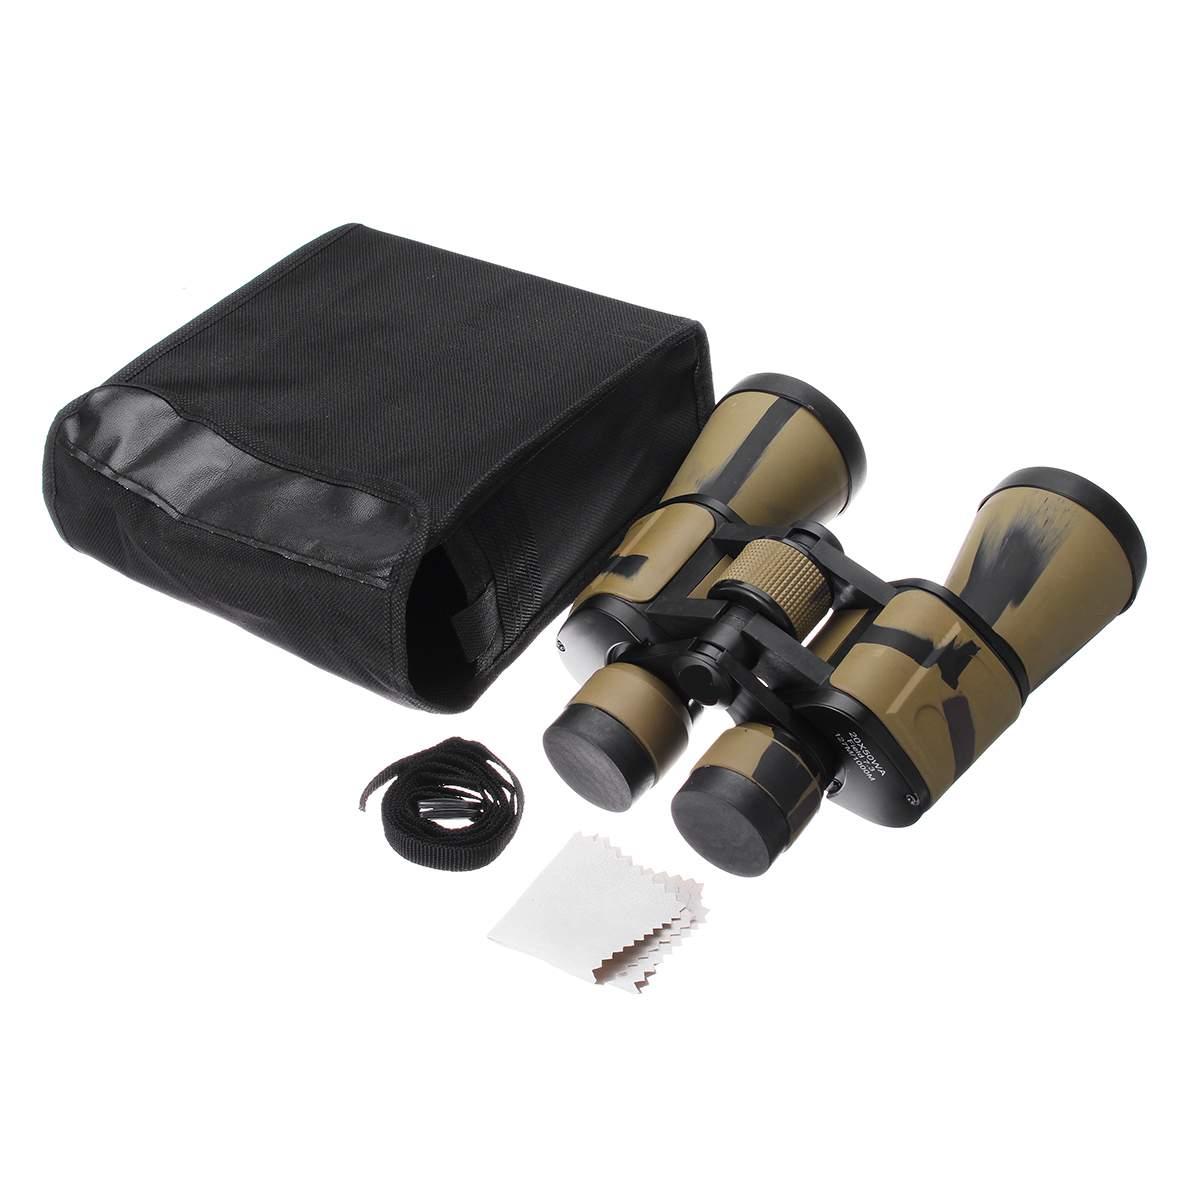 20x50 High Clarity Binoculars Powerful Military binocular For Outdoor Hunting Optical glass Hd Telescope low light Night Vision 6